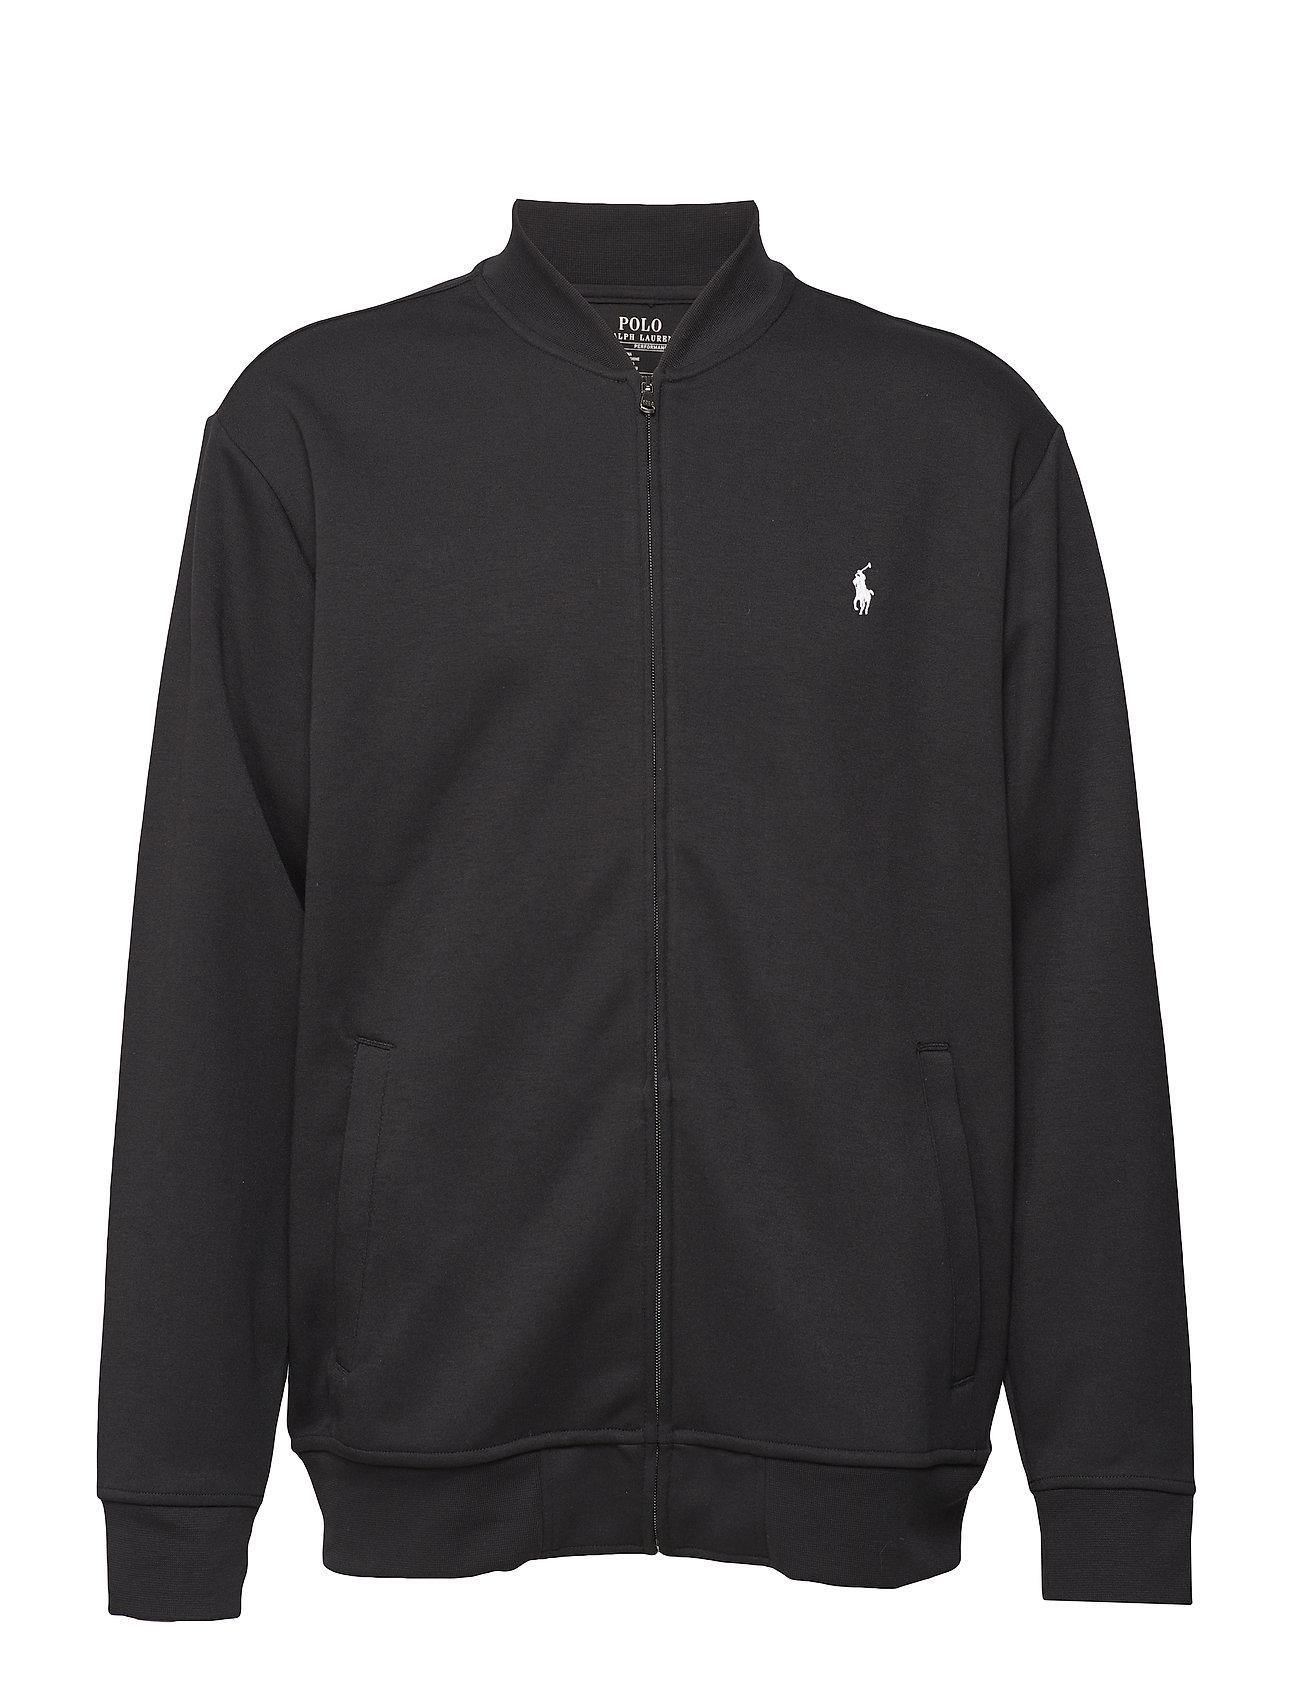 Polo Ralph Lauren Big & Tall Double-Knit Bomber Jacket